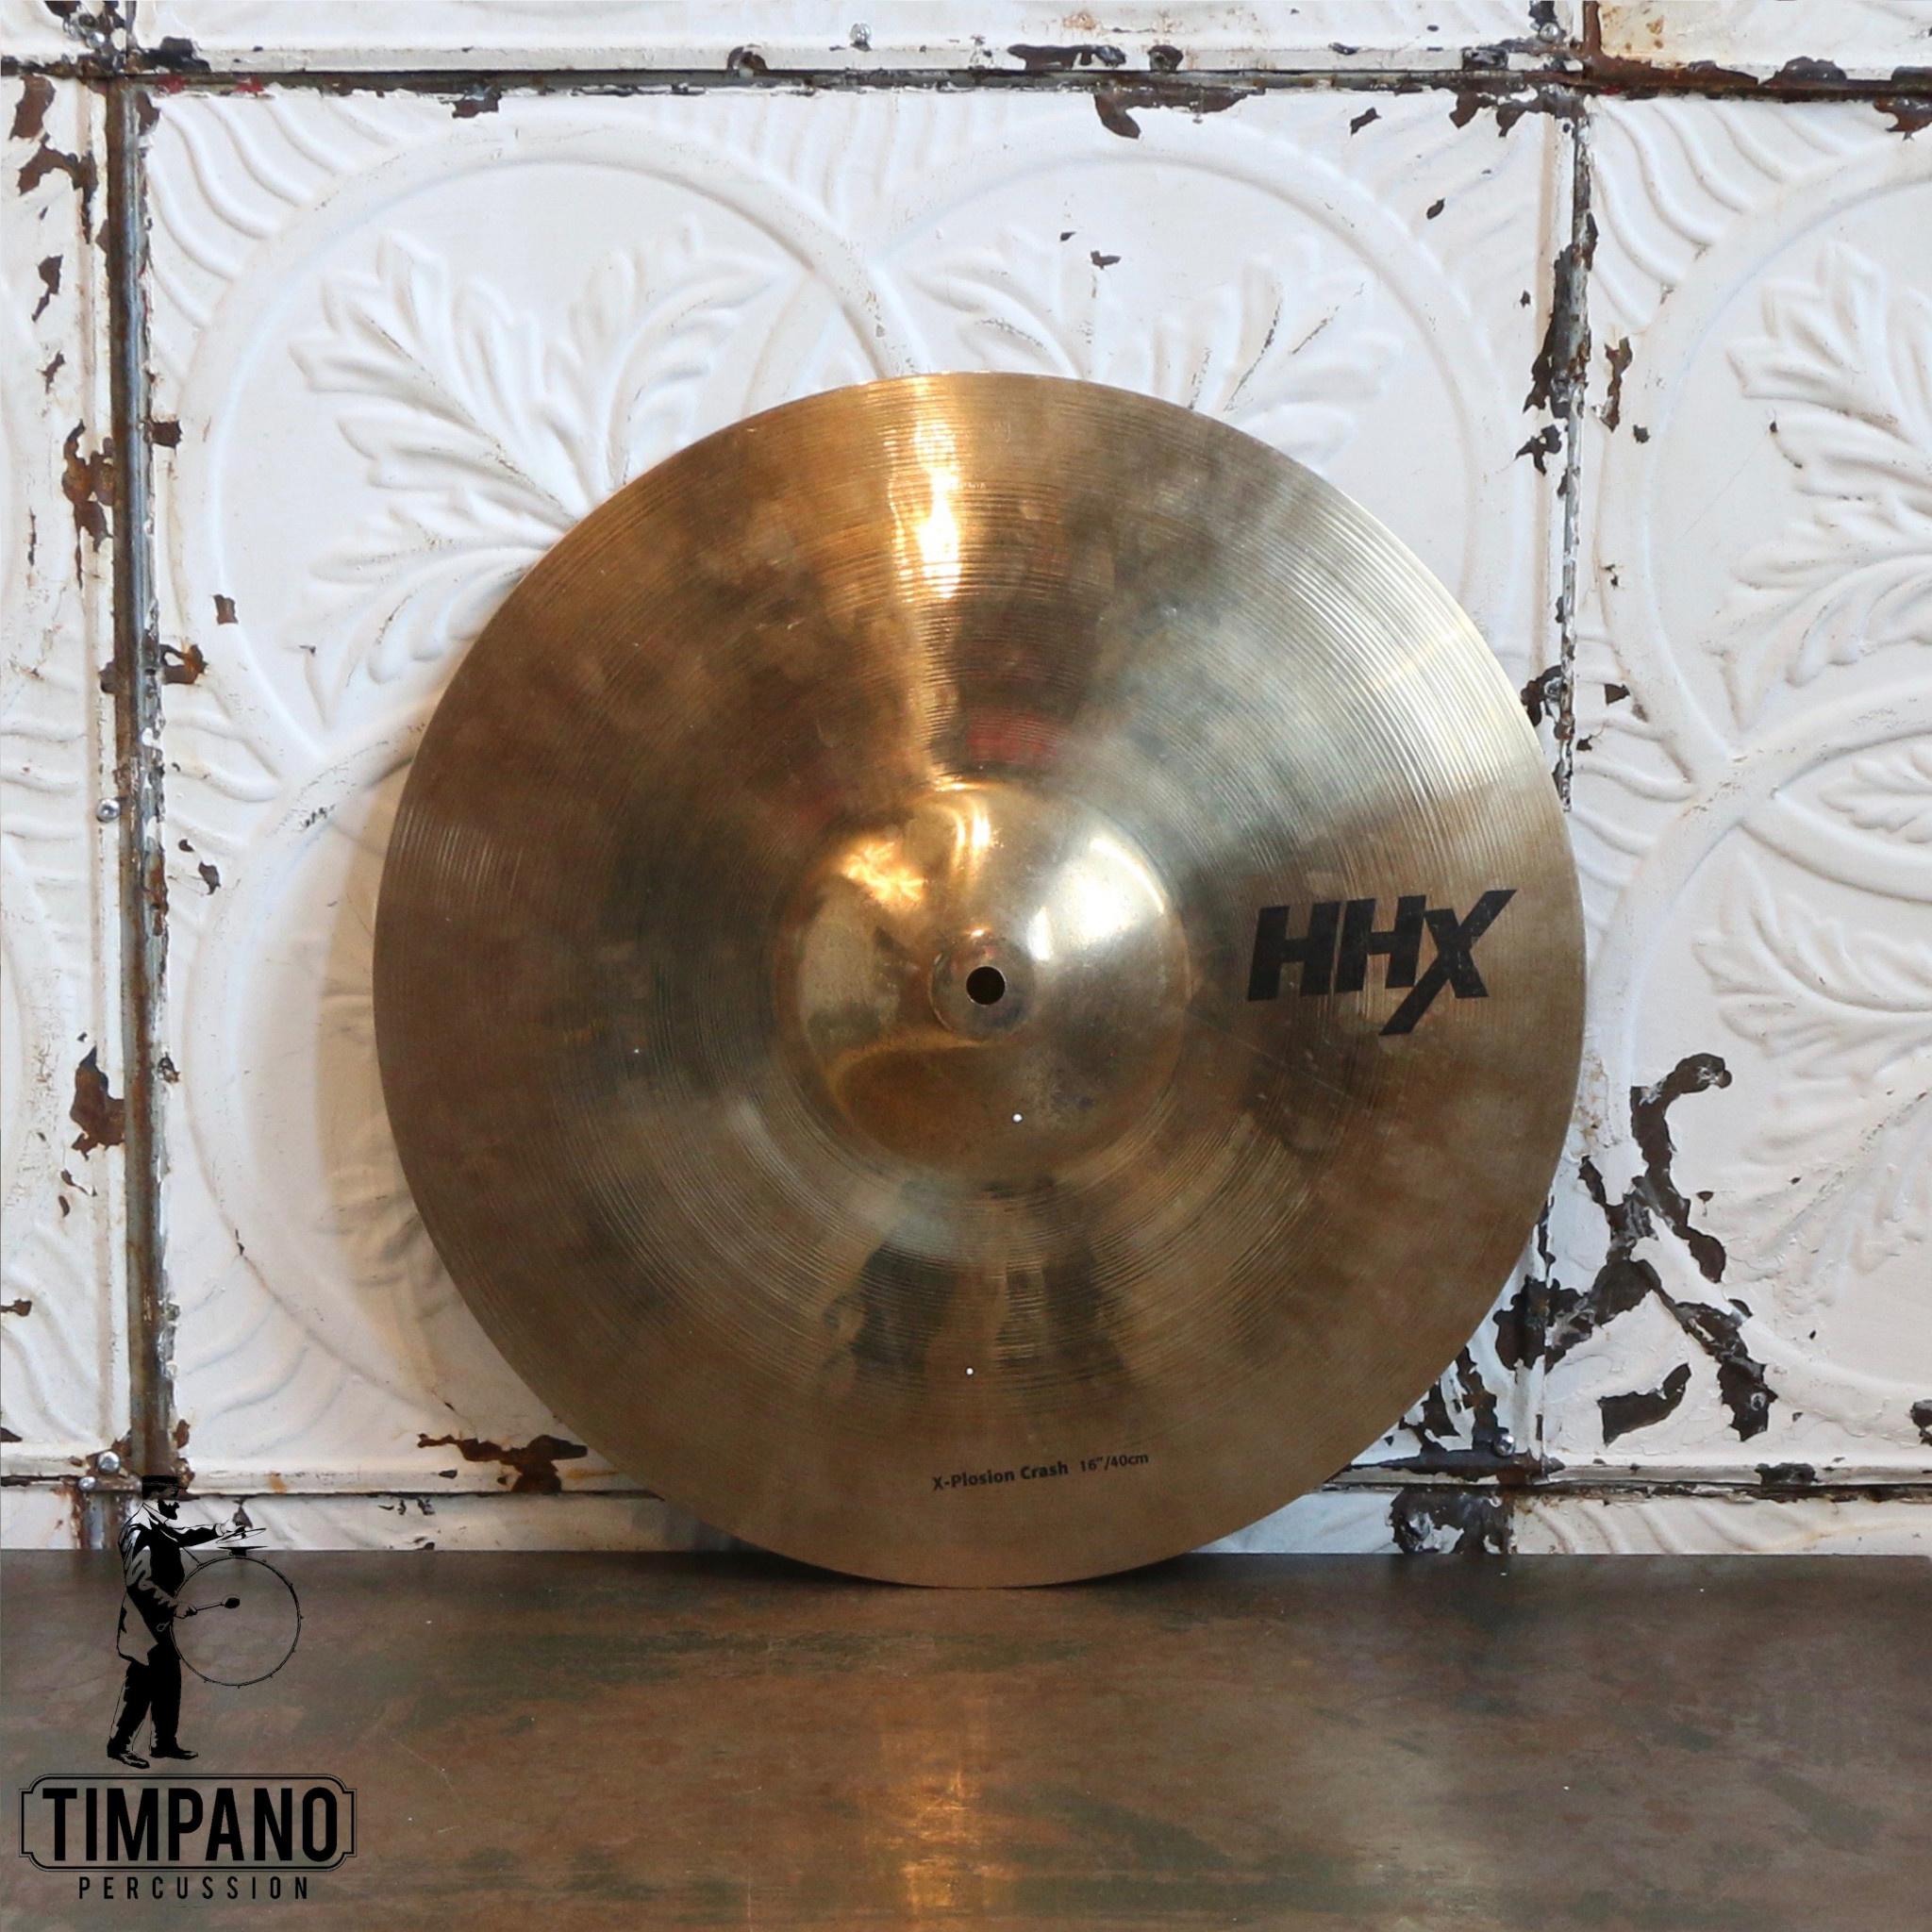 Sabian Used Sabian HHX X-plosion Crash Cymbal 16in